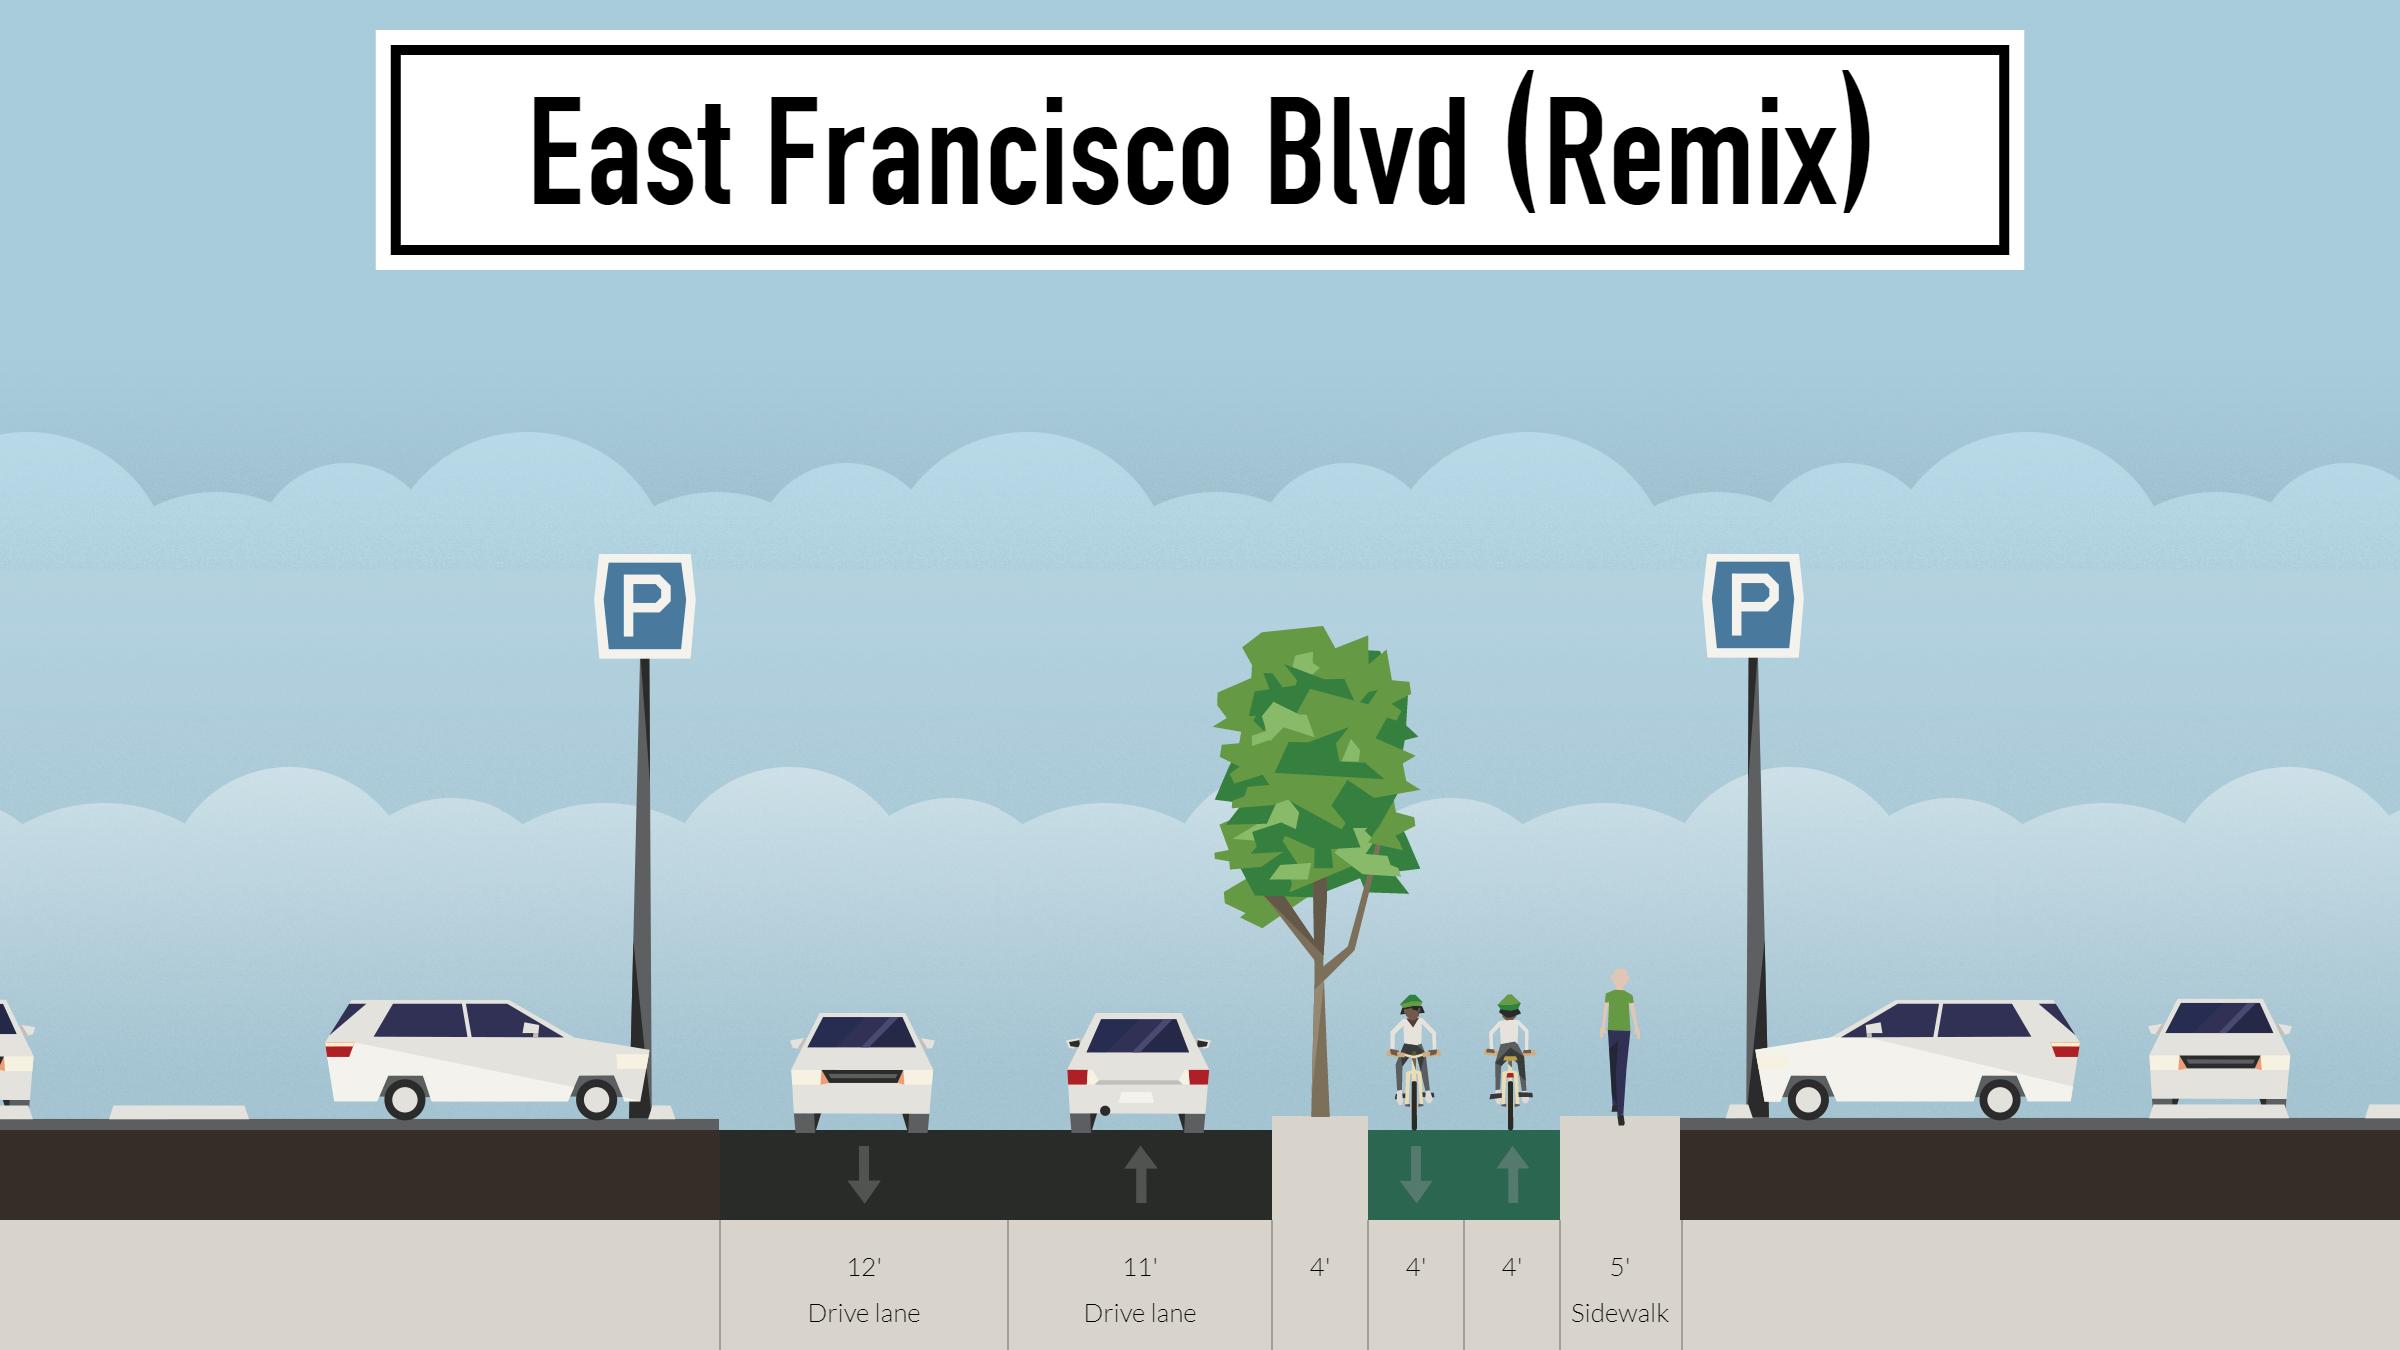 east-francisco-blvd-remix.png